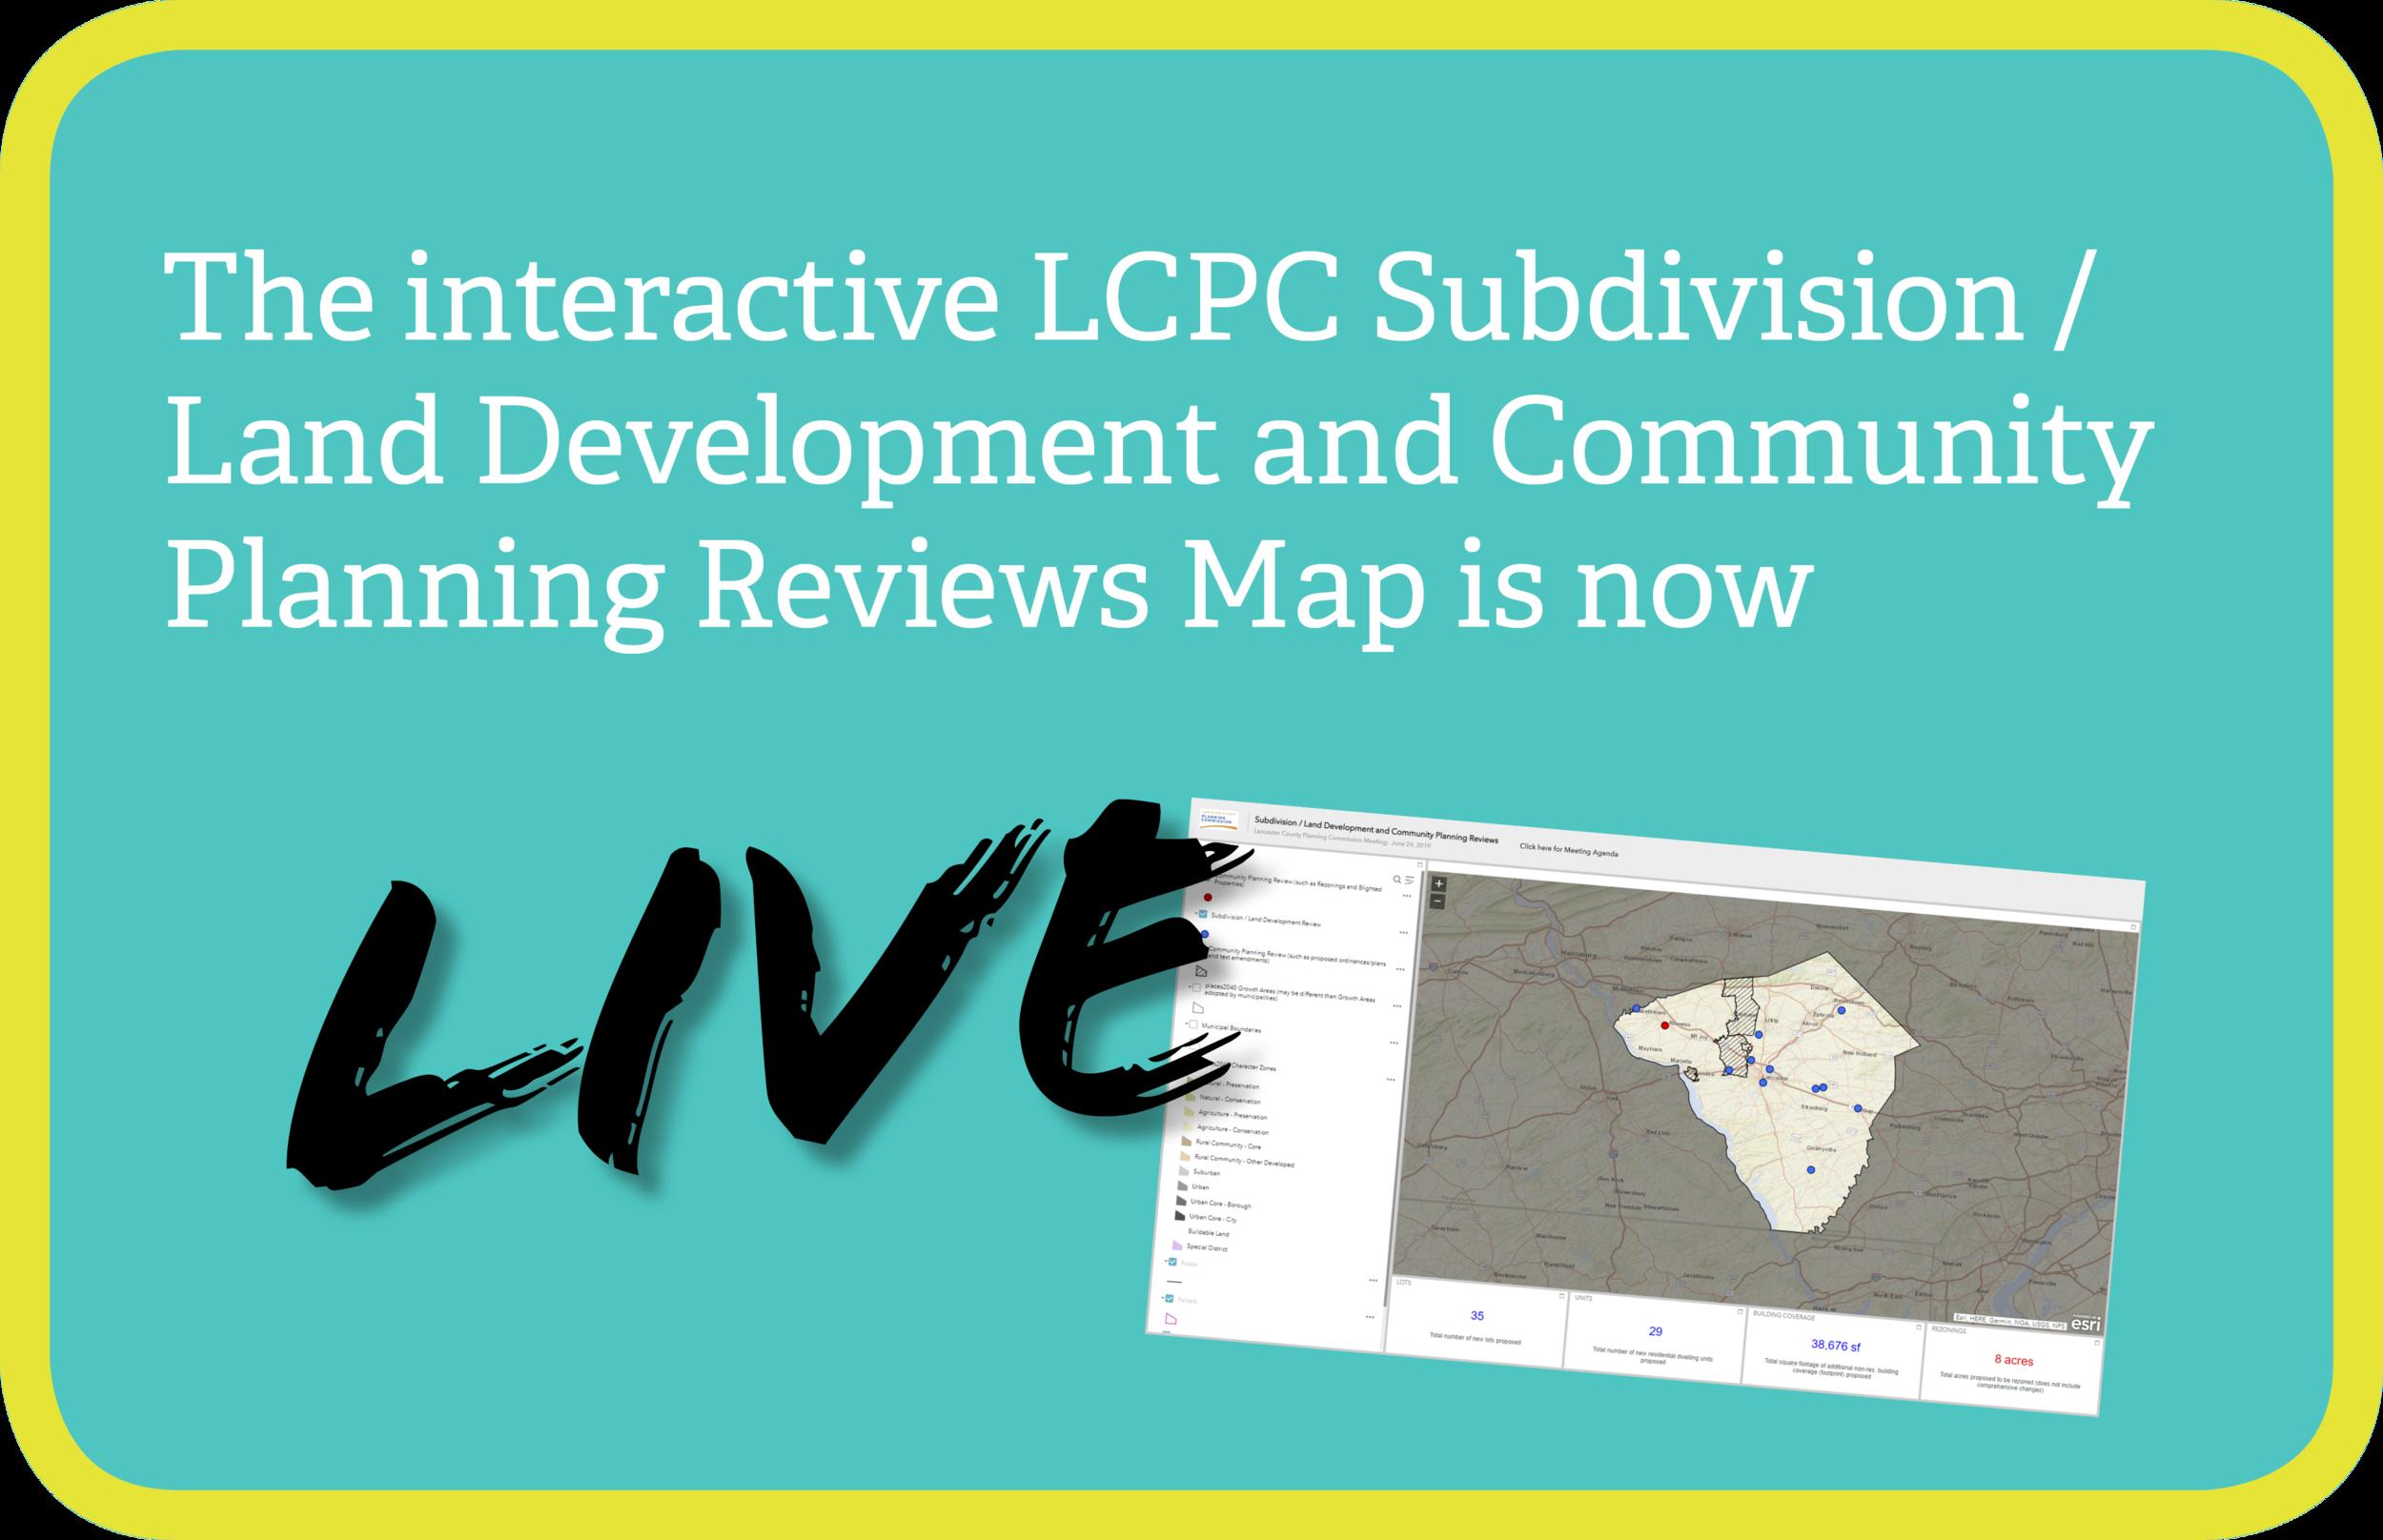 956x618_LCPC-meeting-map-intro_v1 Squaresp June 27 19.png